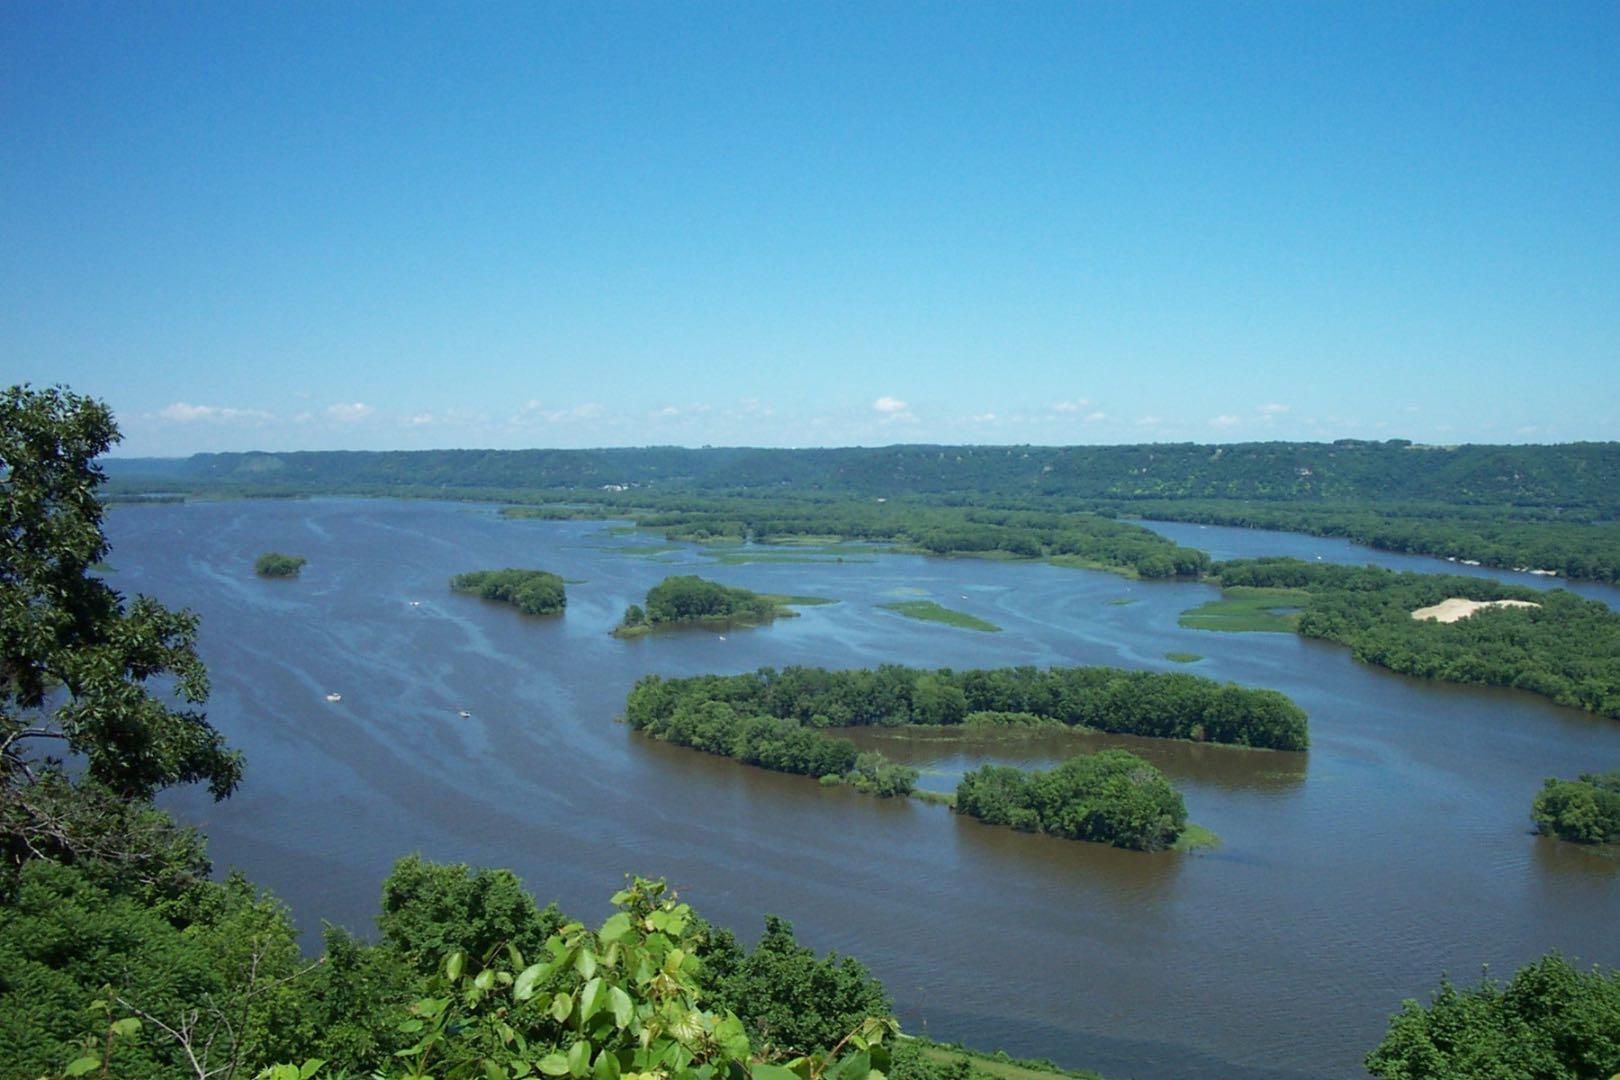 Mississippi in Iowa